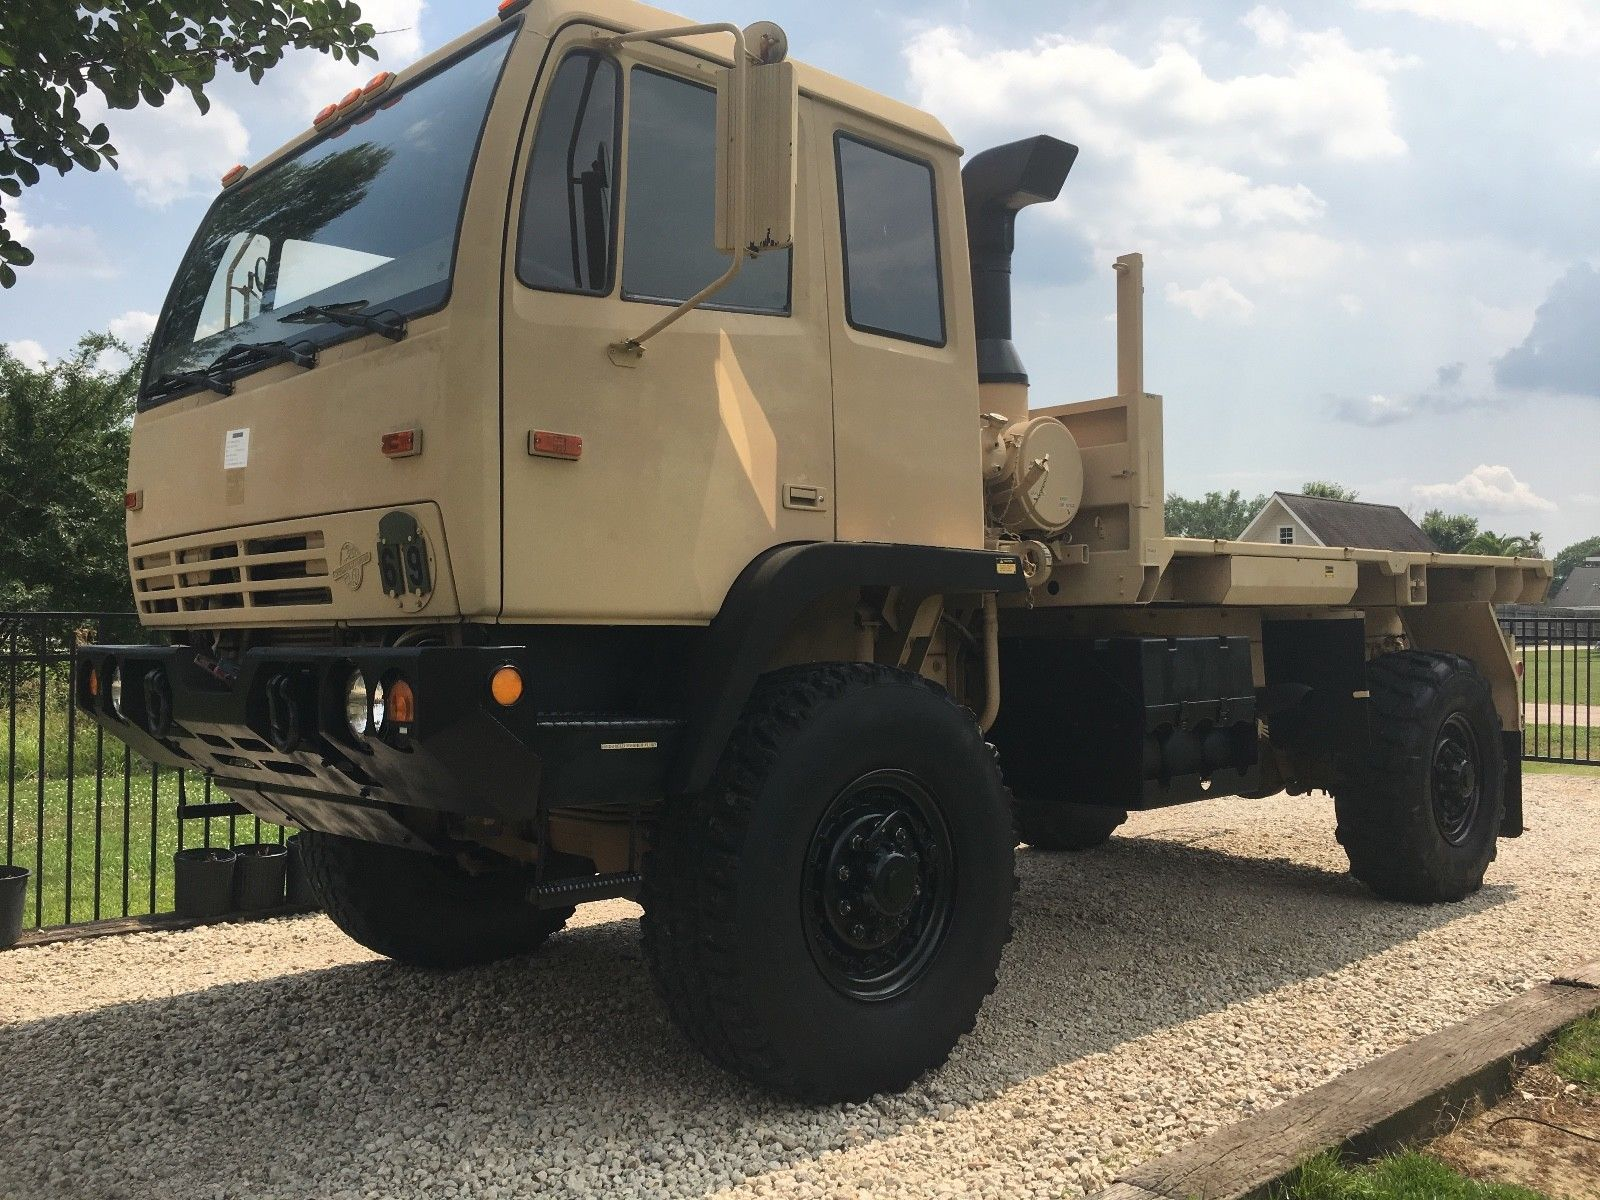 clean 1998 Stewart & Stevenson LMTV M1078 4X4 Military Flatbed Truck for sale